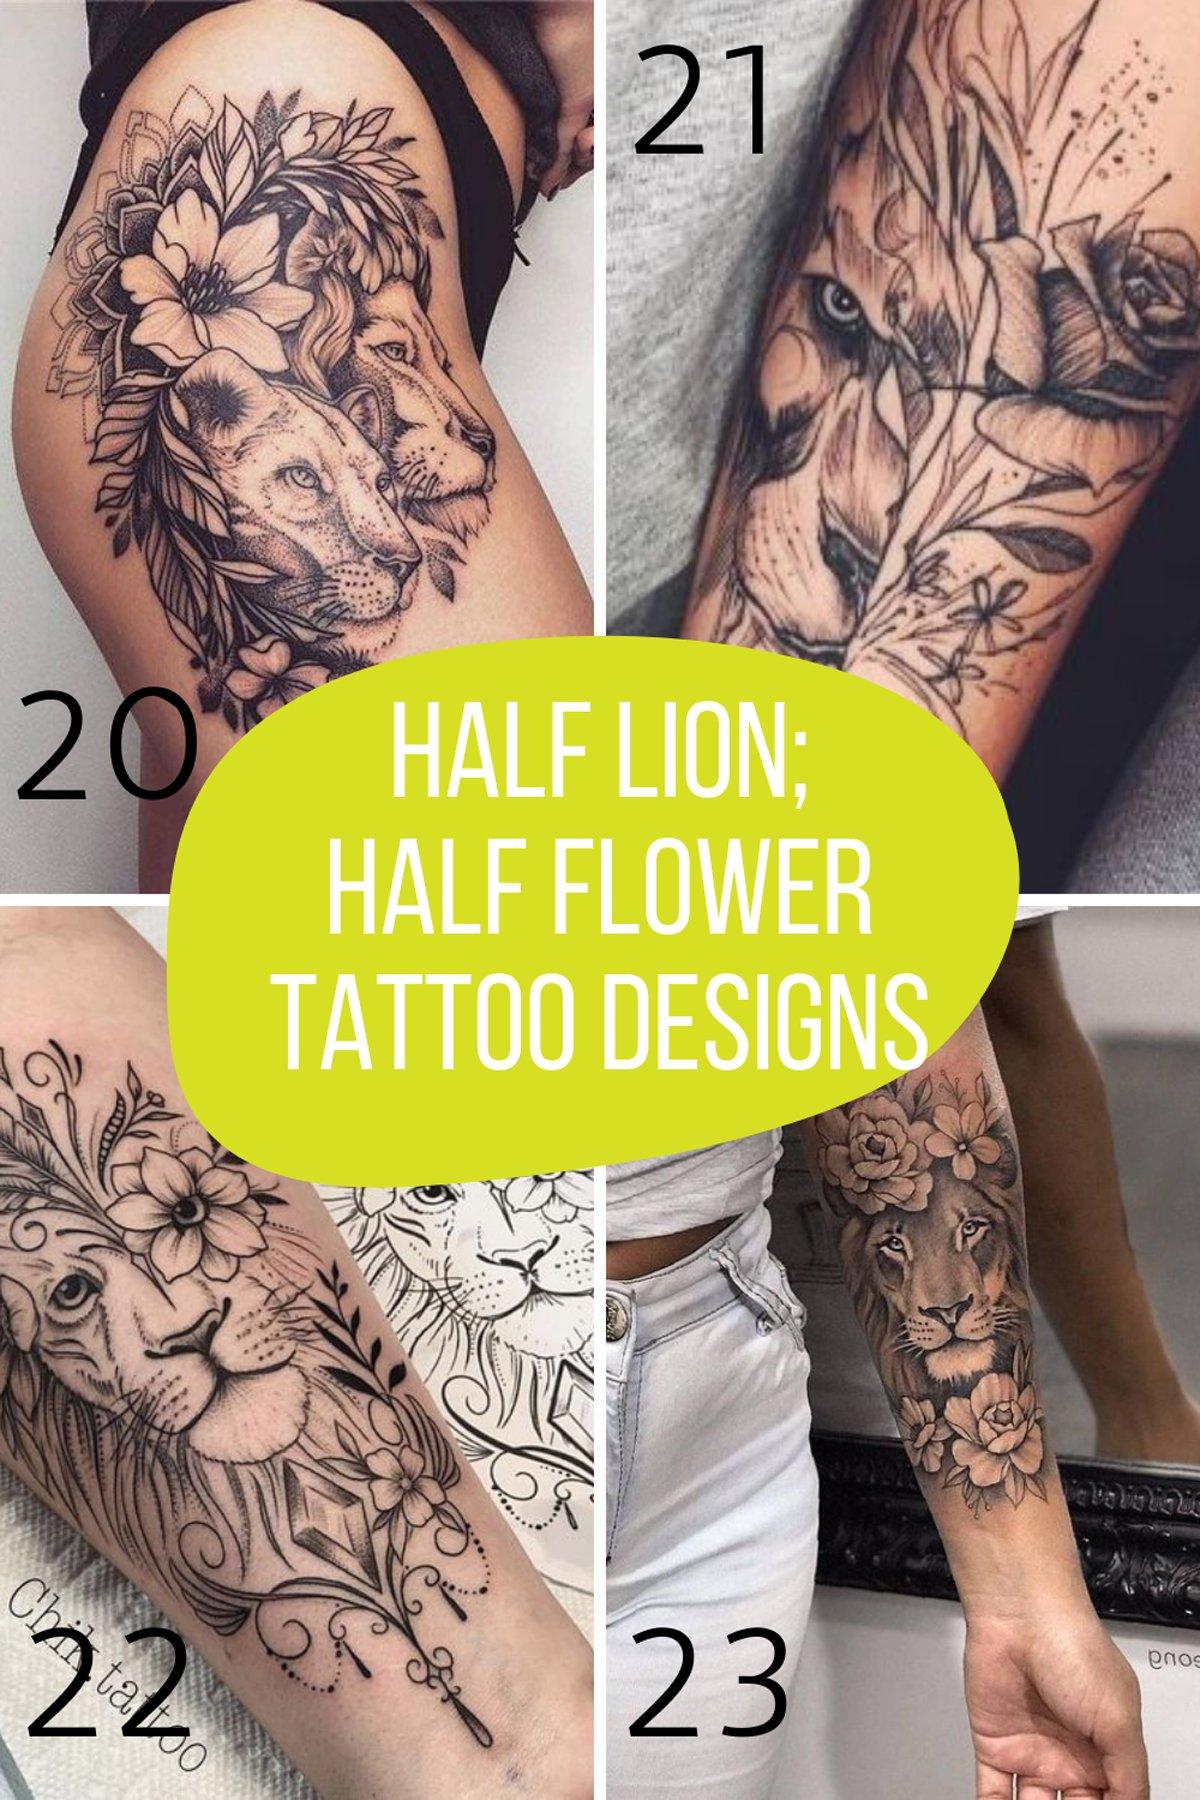 Girl with half lion tattoo ideas